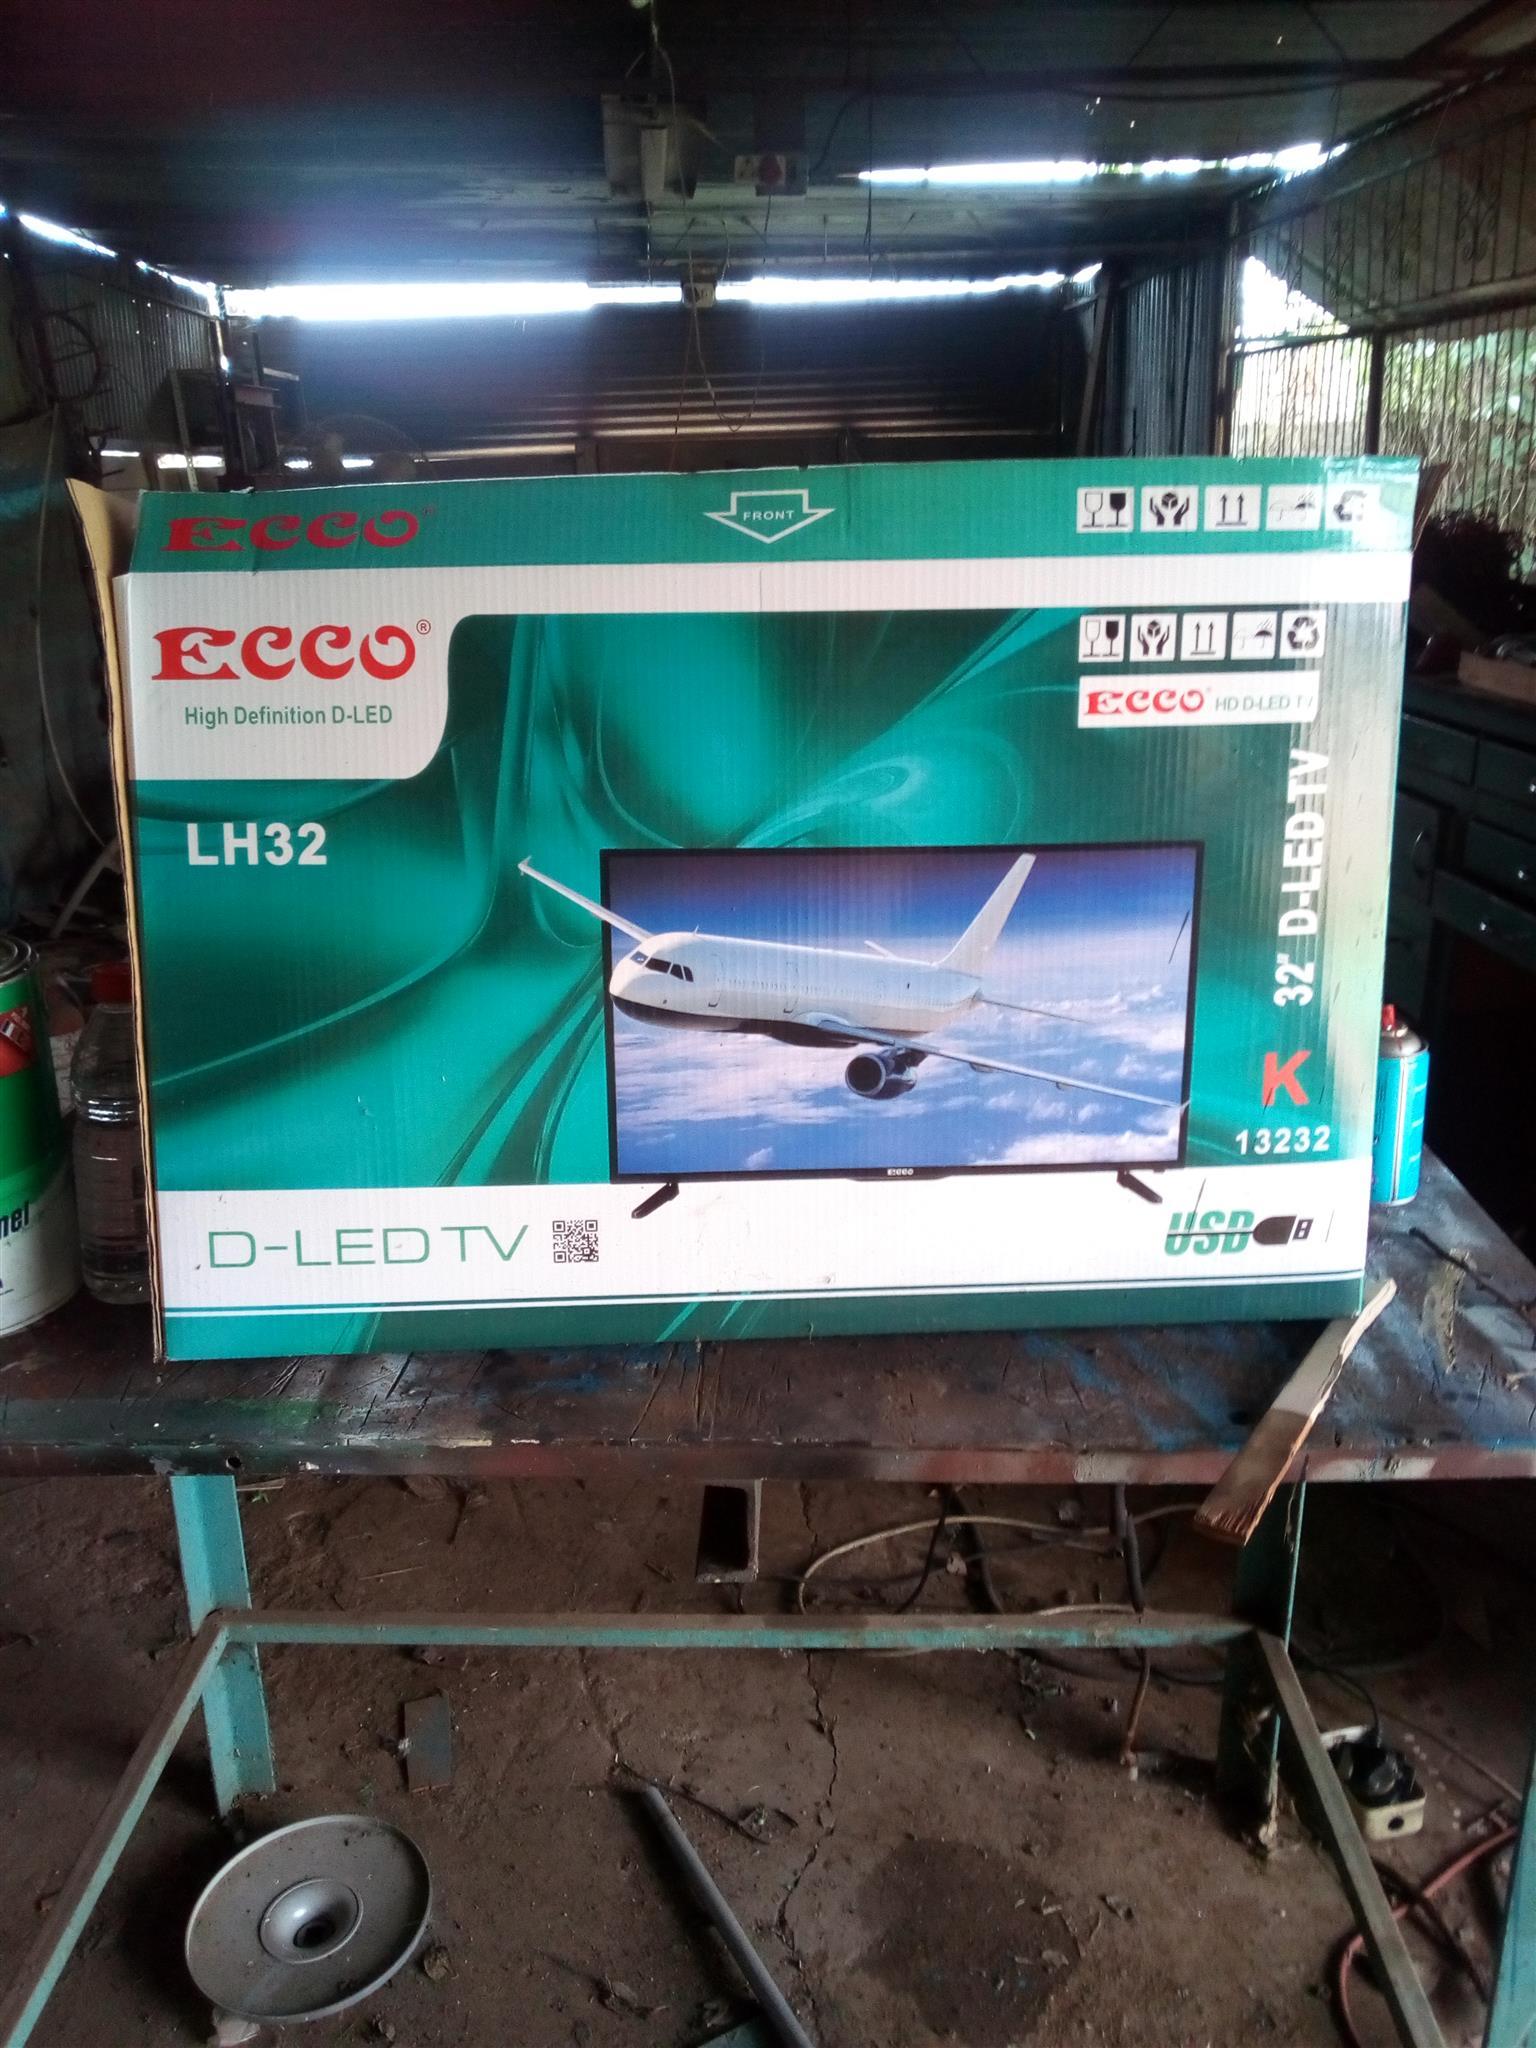 Etcco flat-screen tv